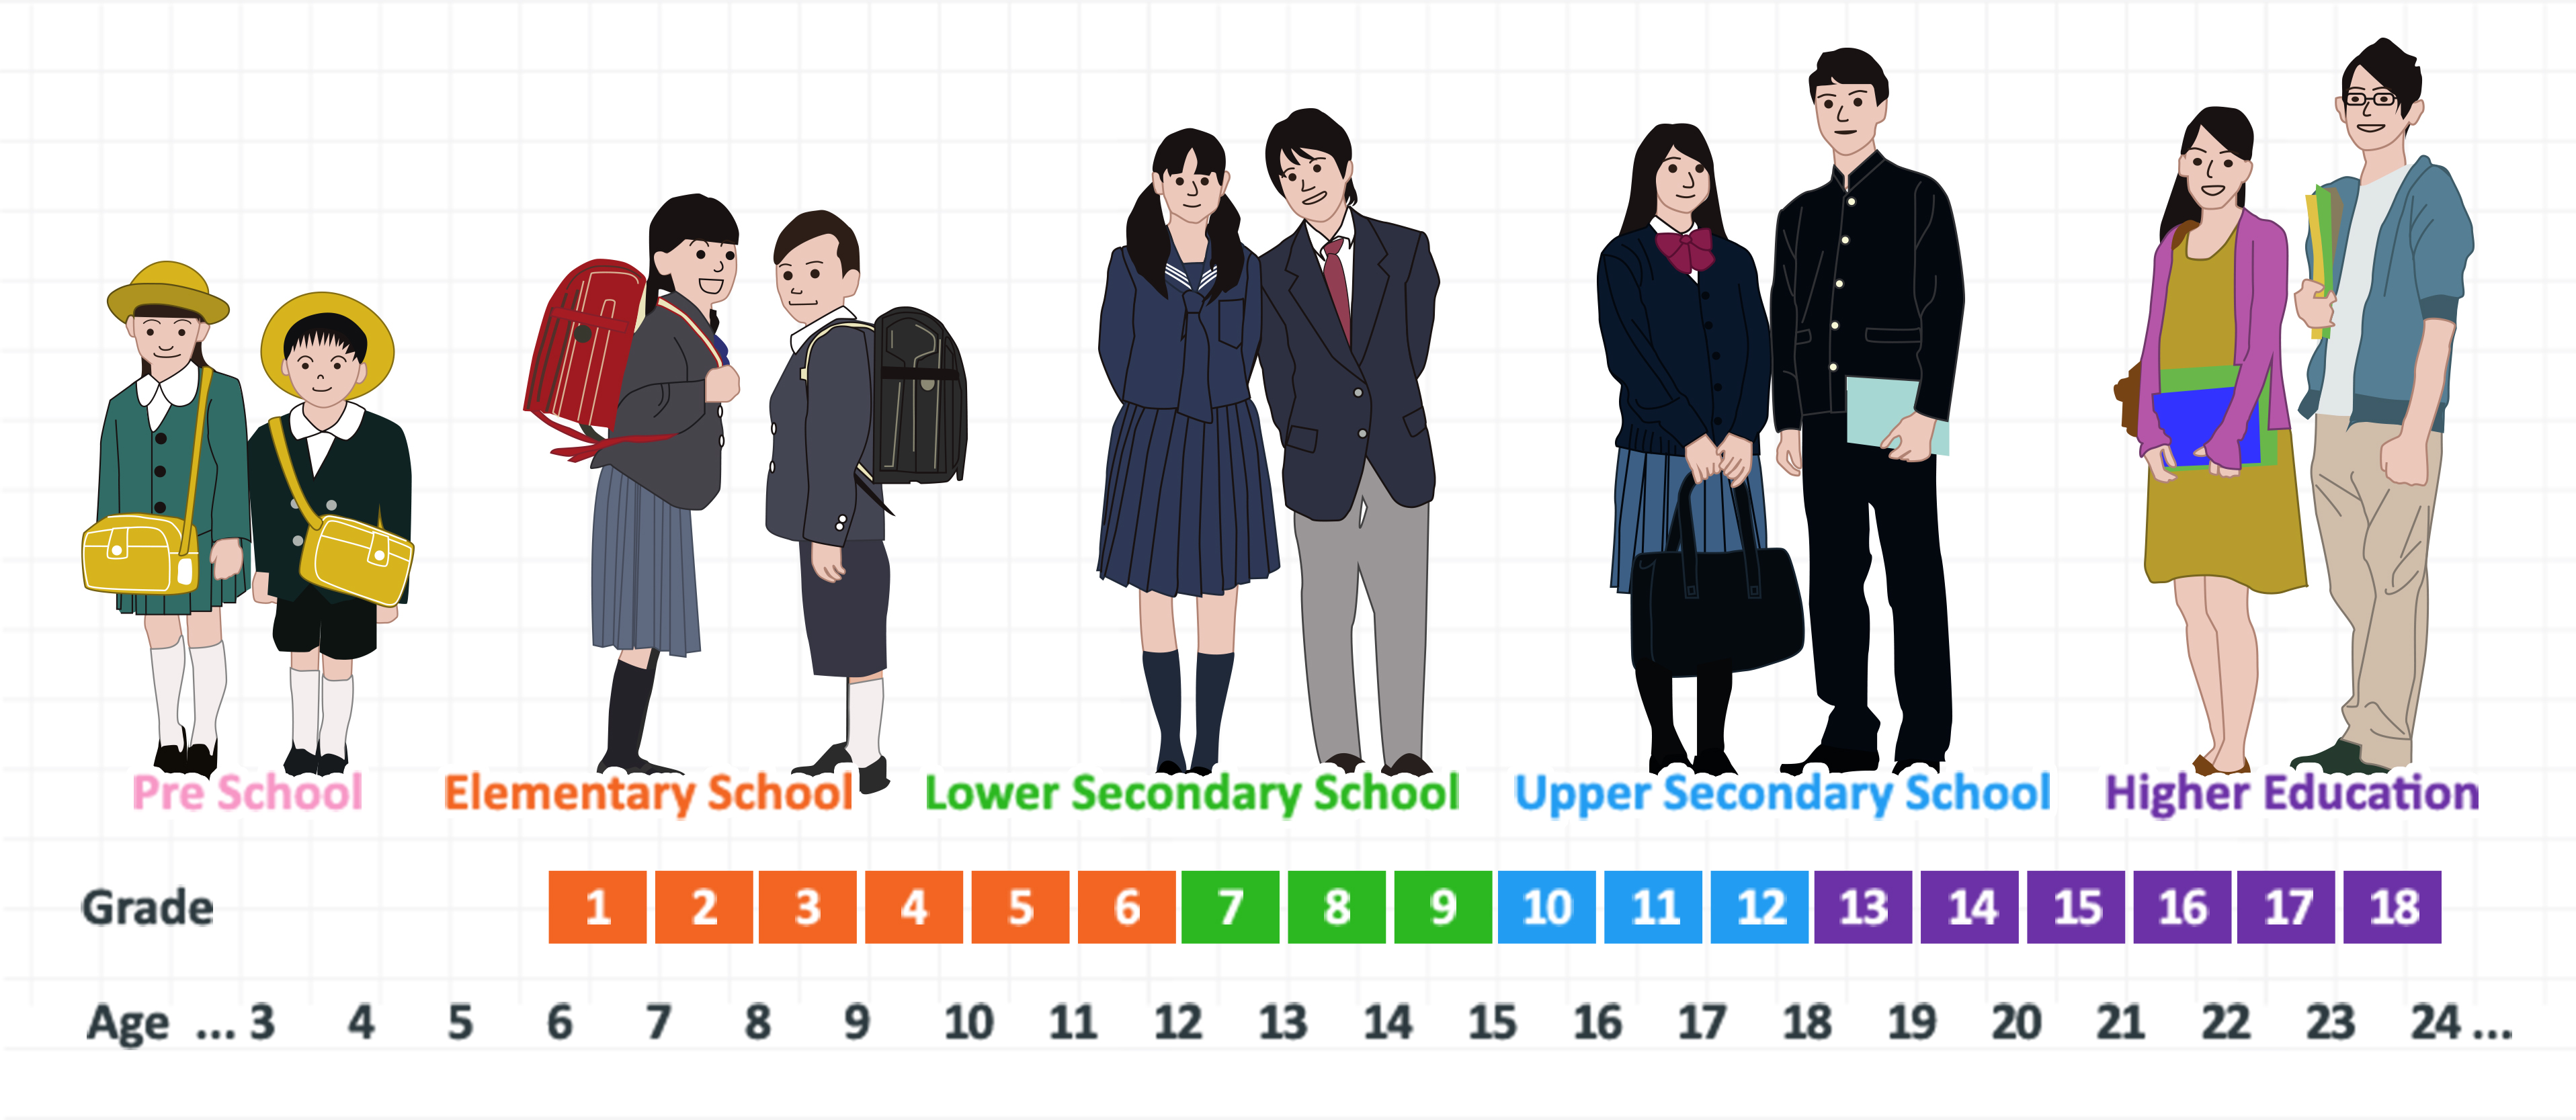 Japanese School System